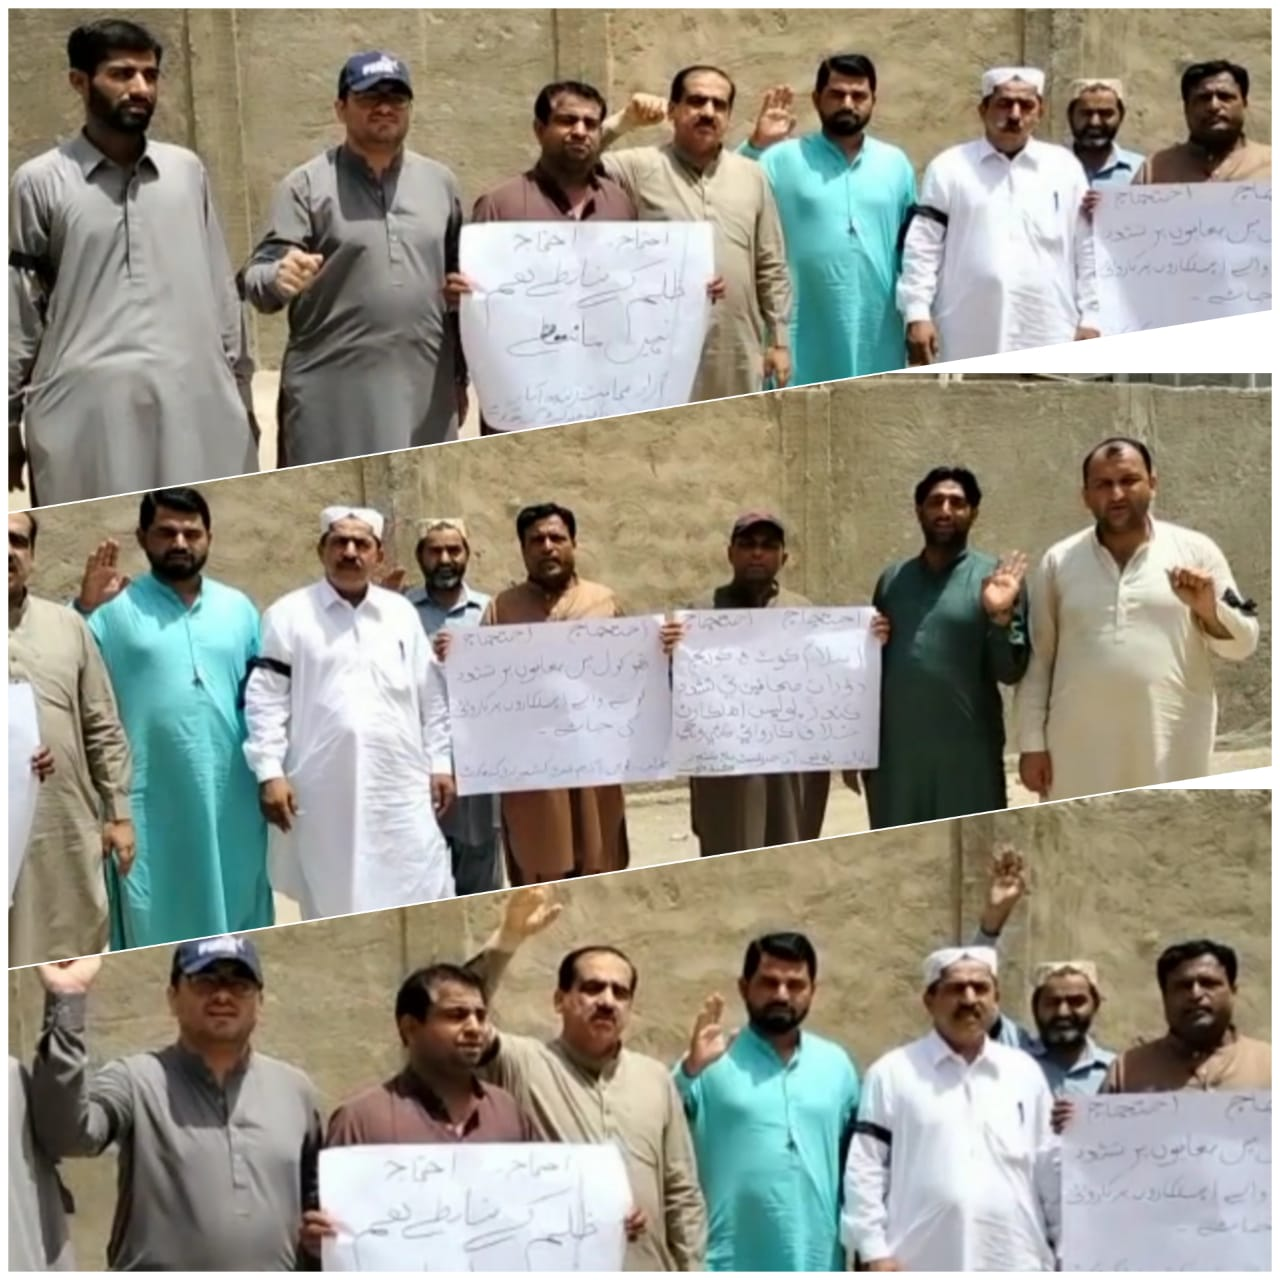 کندھ کوٹ : صحافی سراپا احتجاج